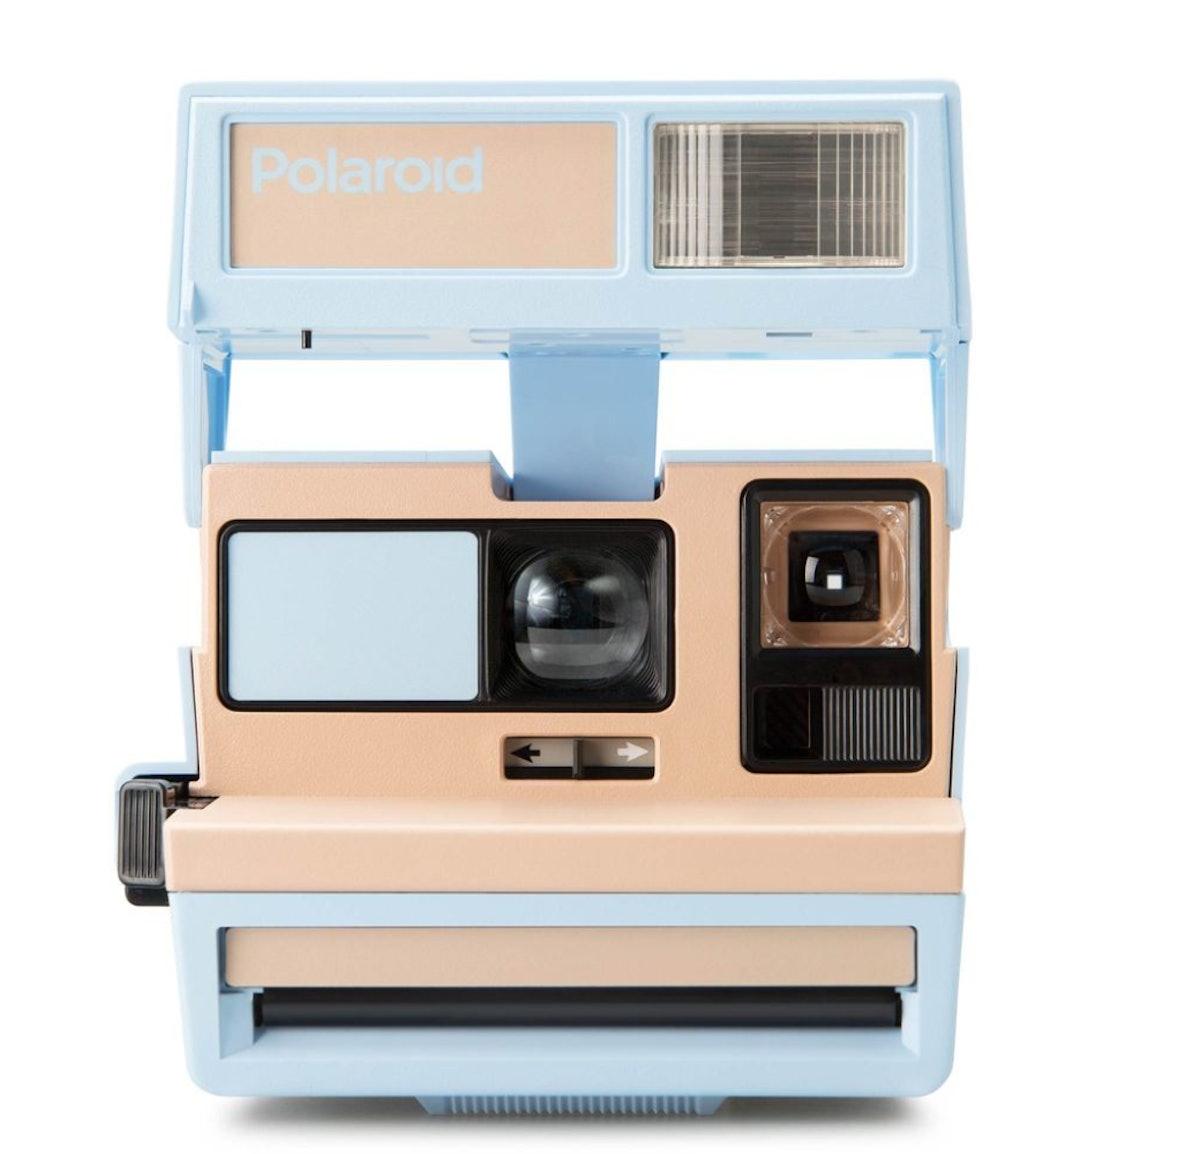 Polaroid 600 Camera - Blueberry Burst